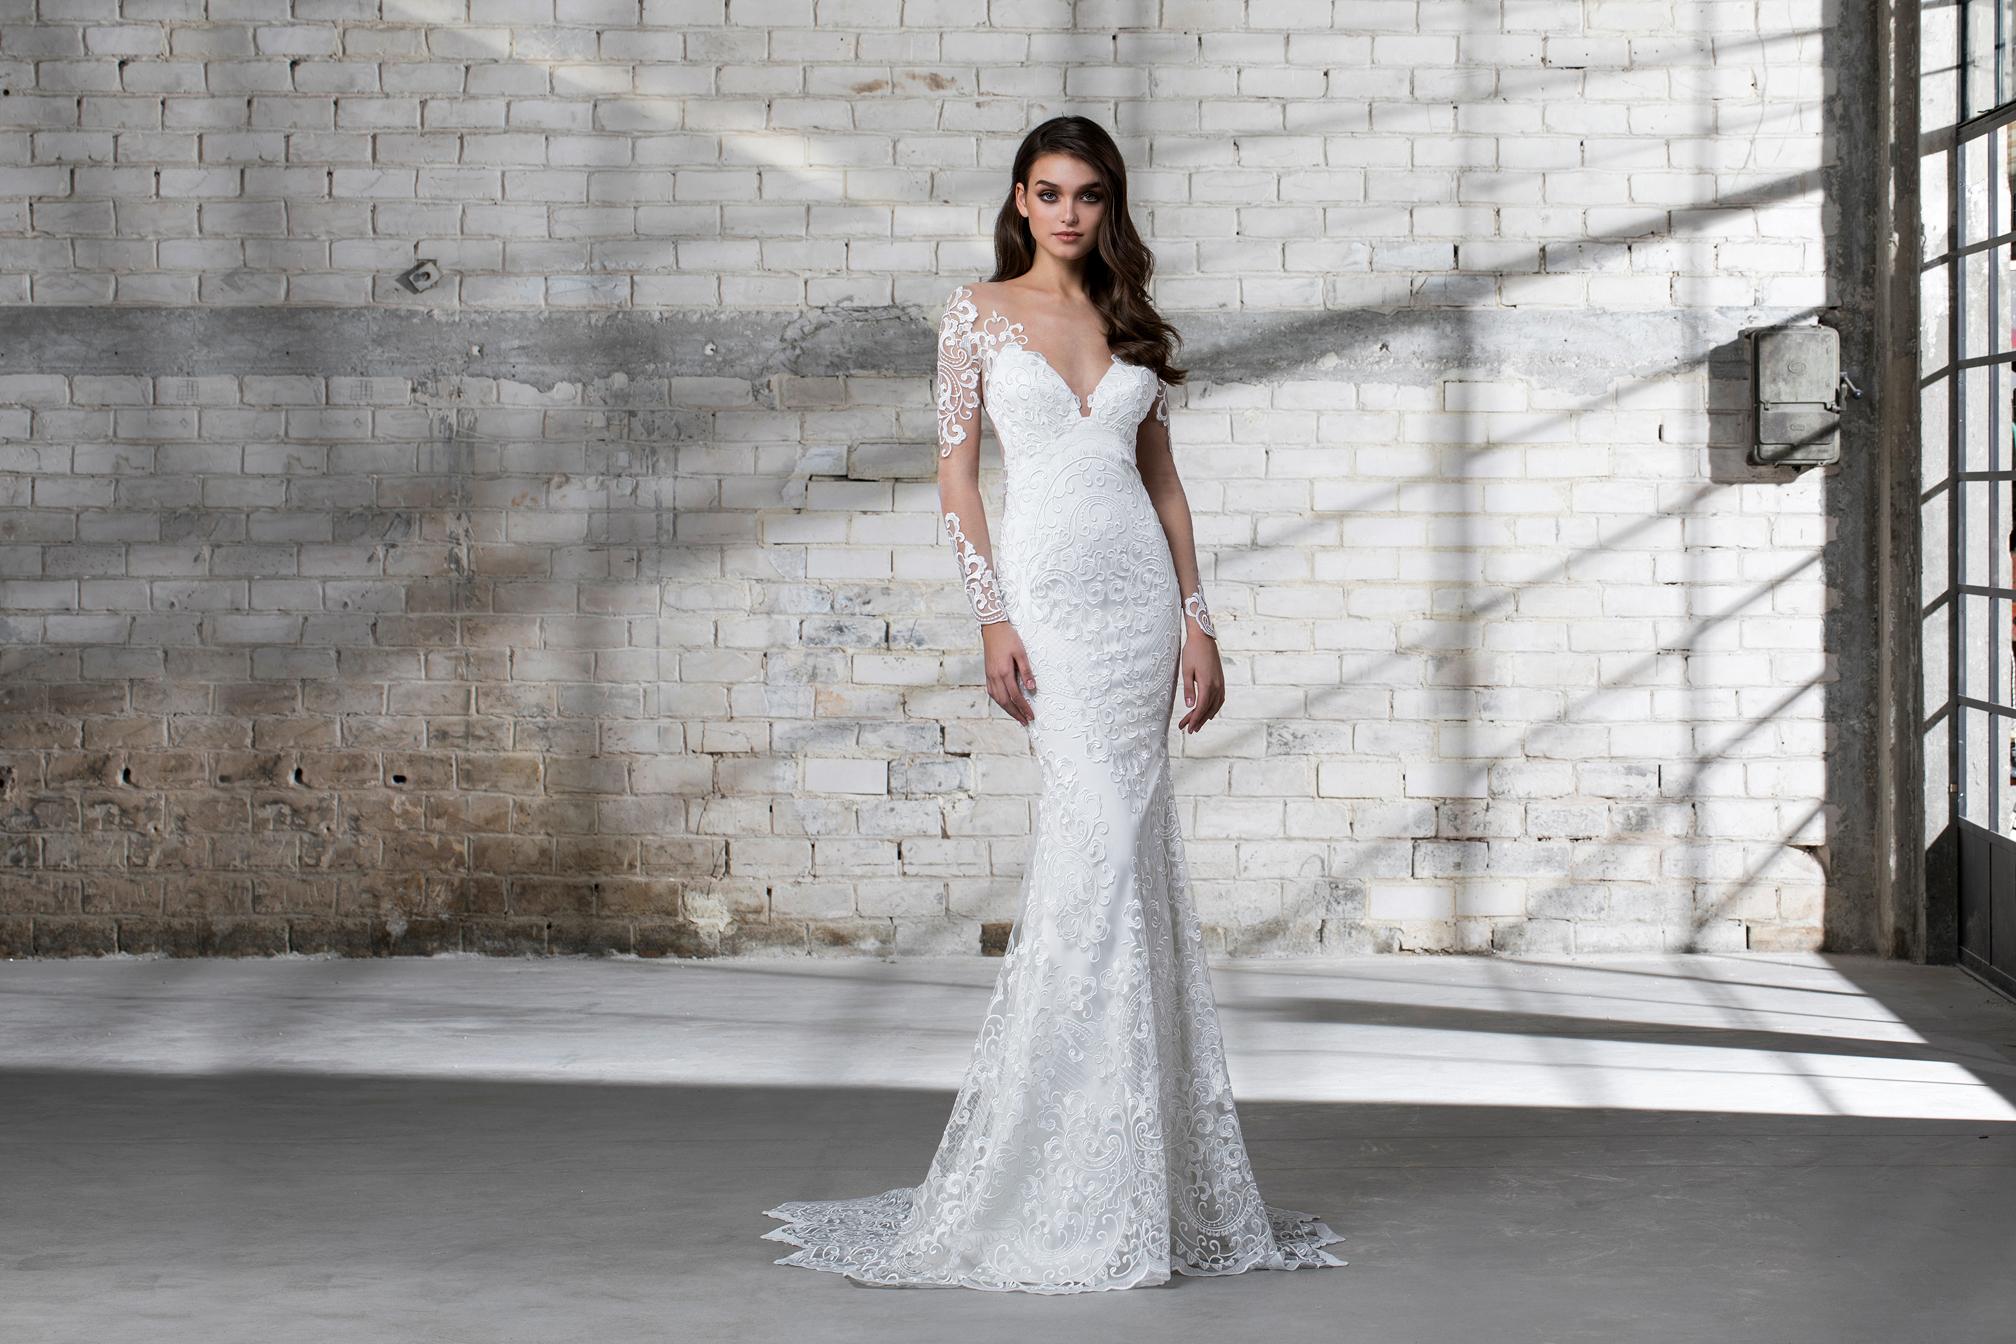 pnina tornai wedding dress spring 2019 trumpet lace off the shoulder